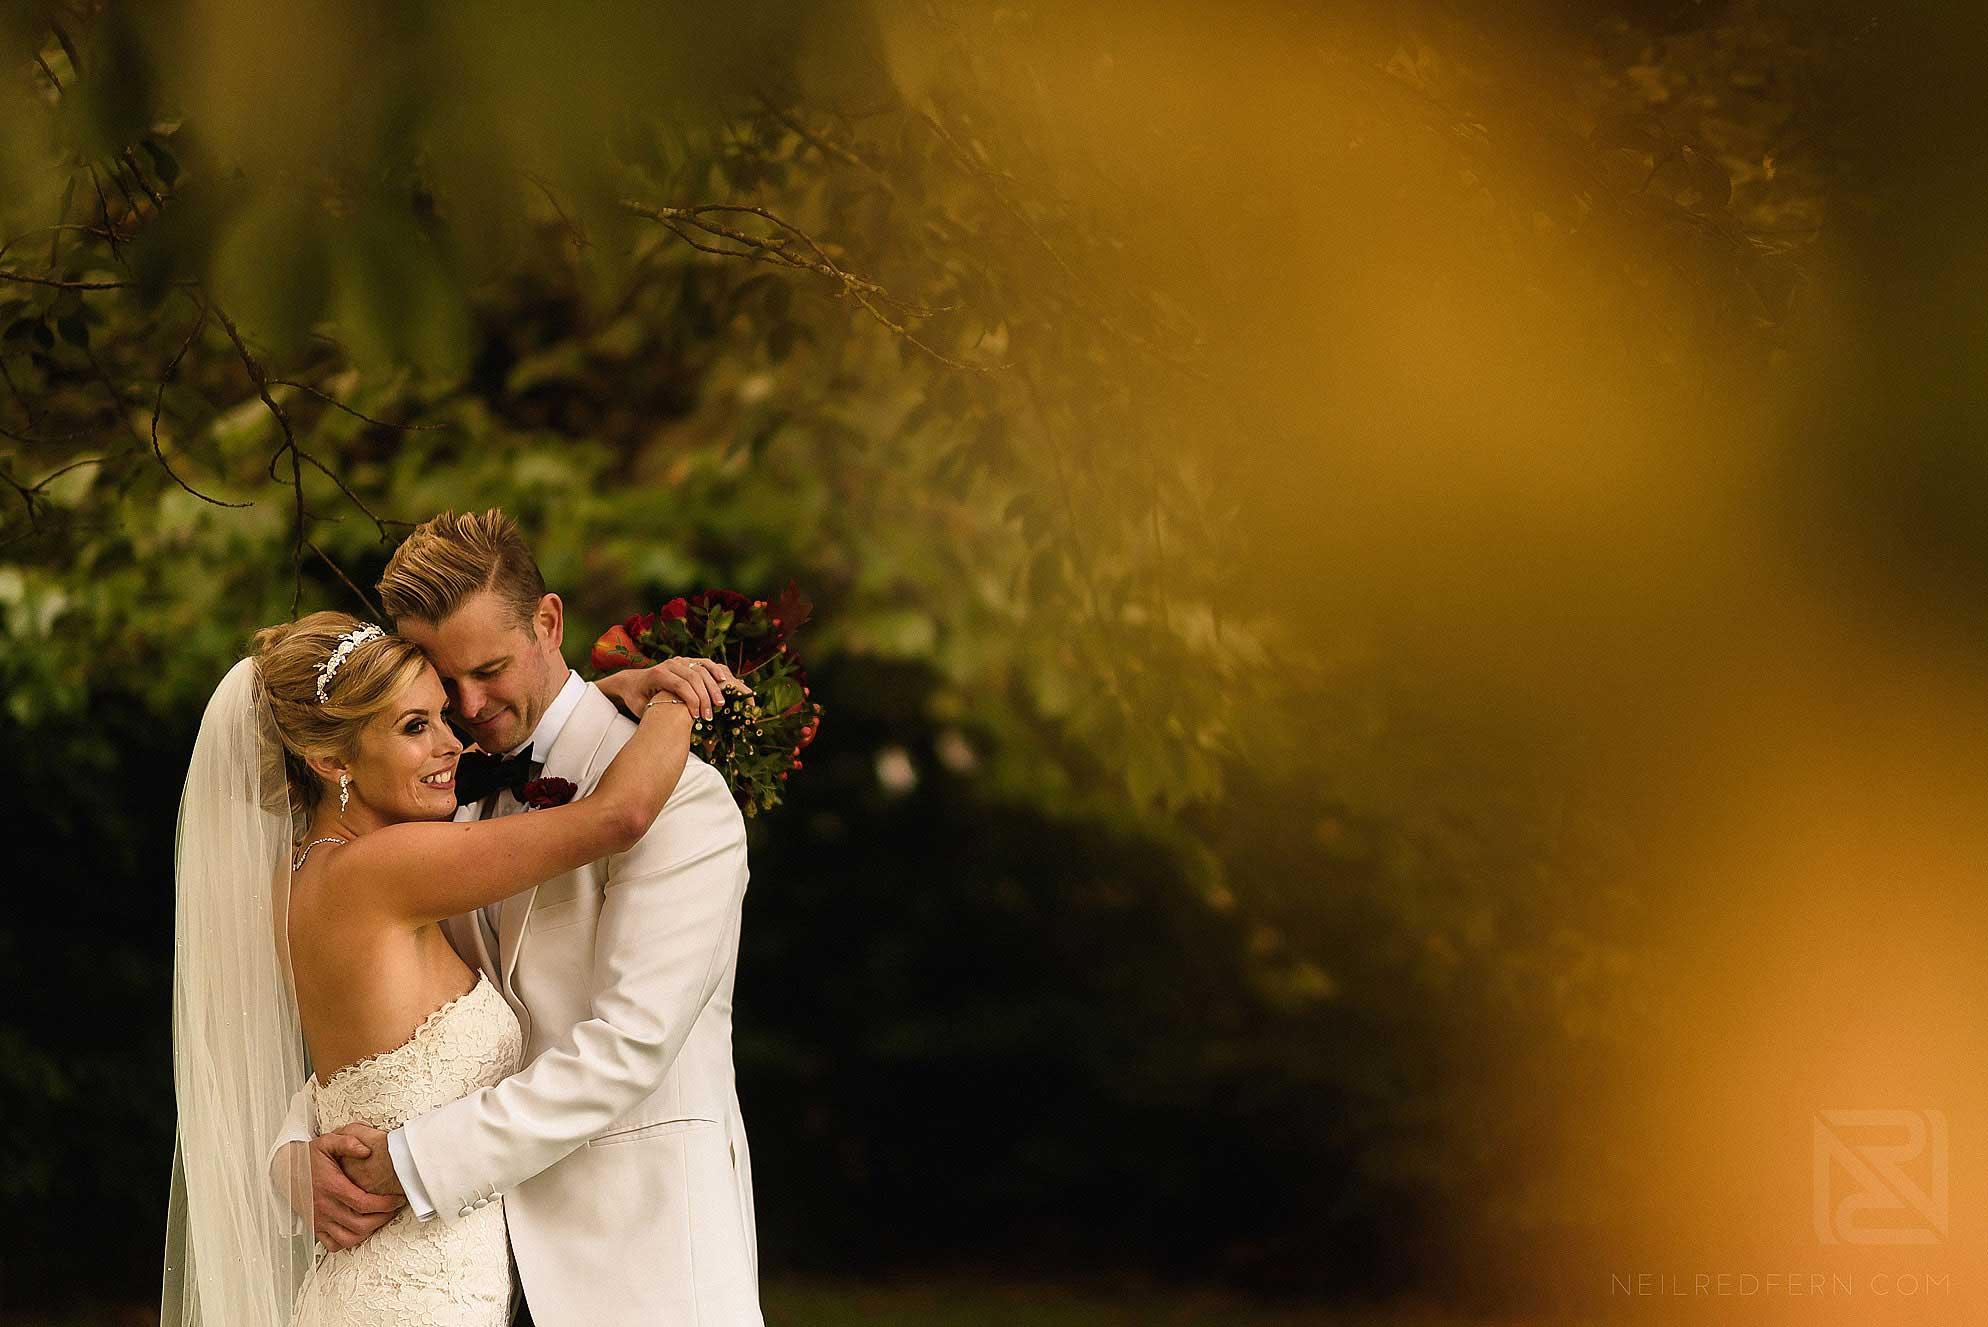 romantic moment between bride and groom